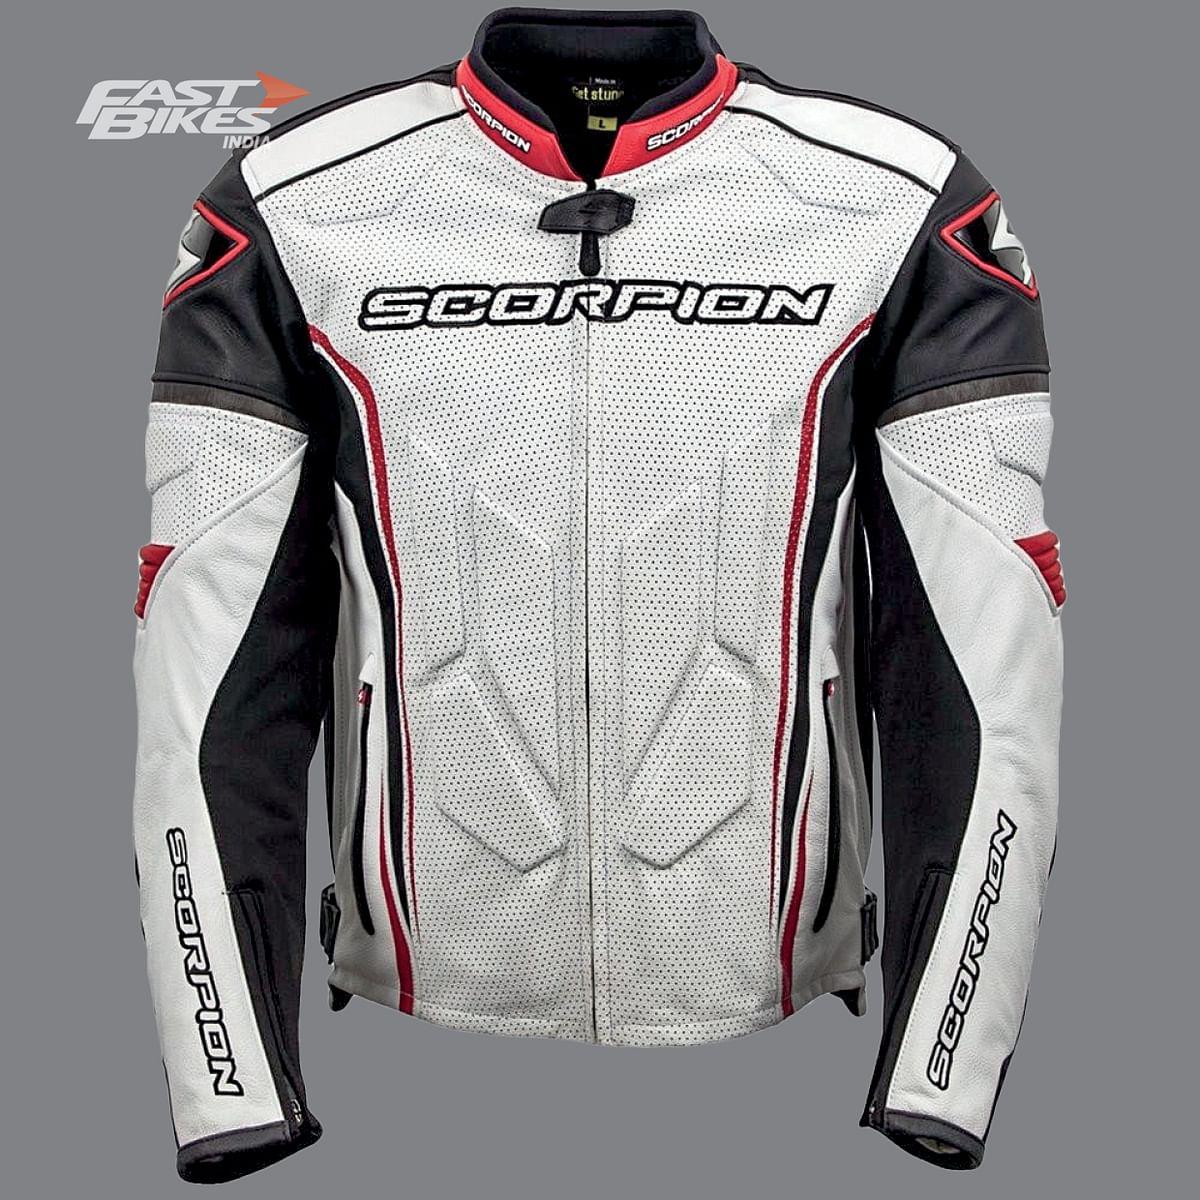 Scorpion Exo Clutch Jacket